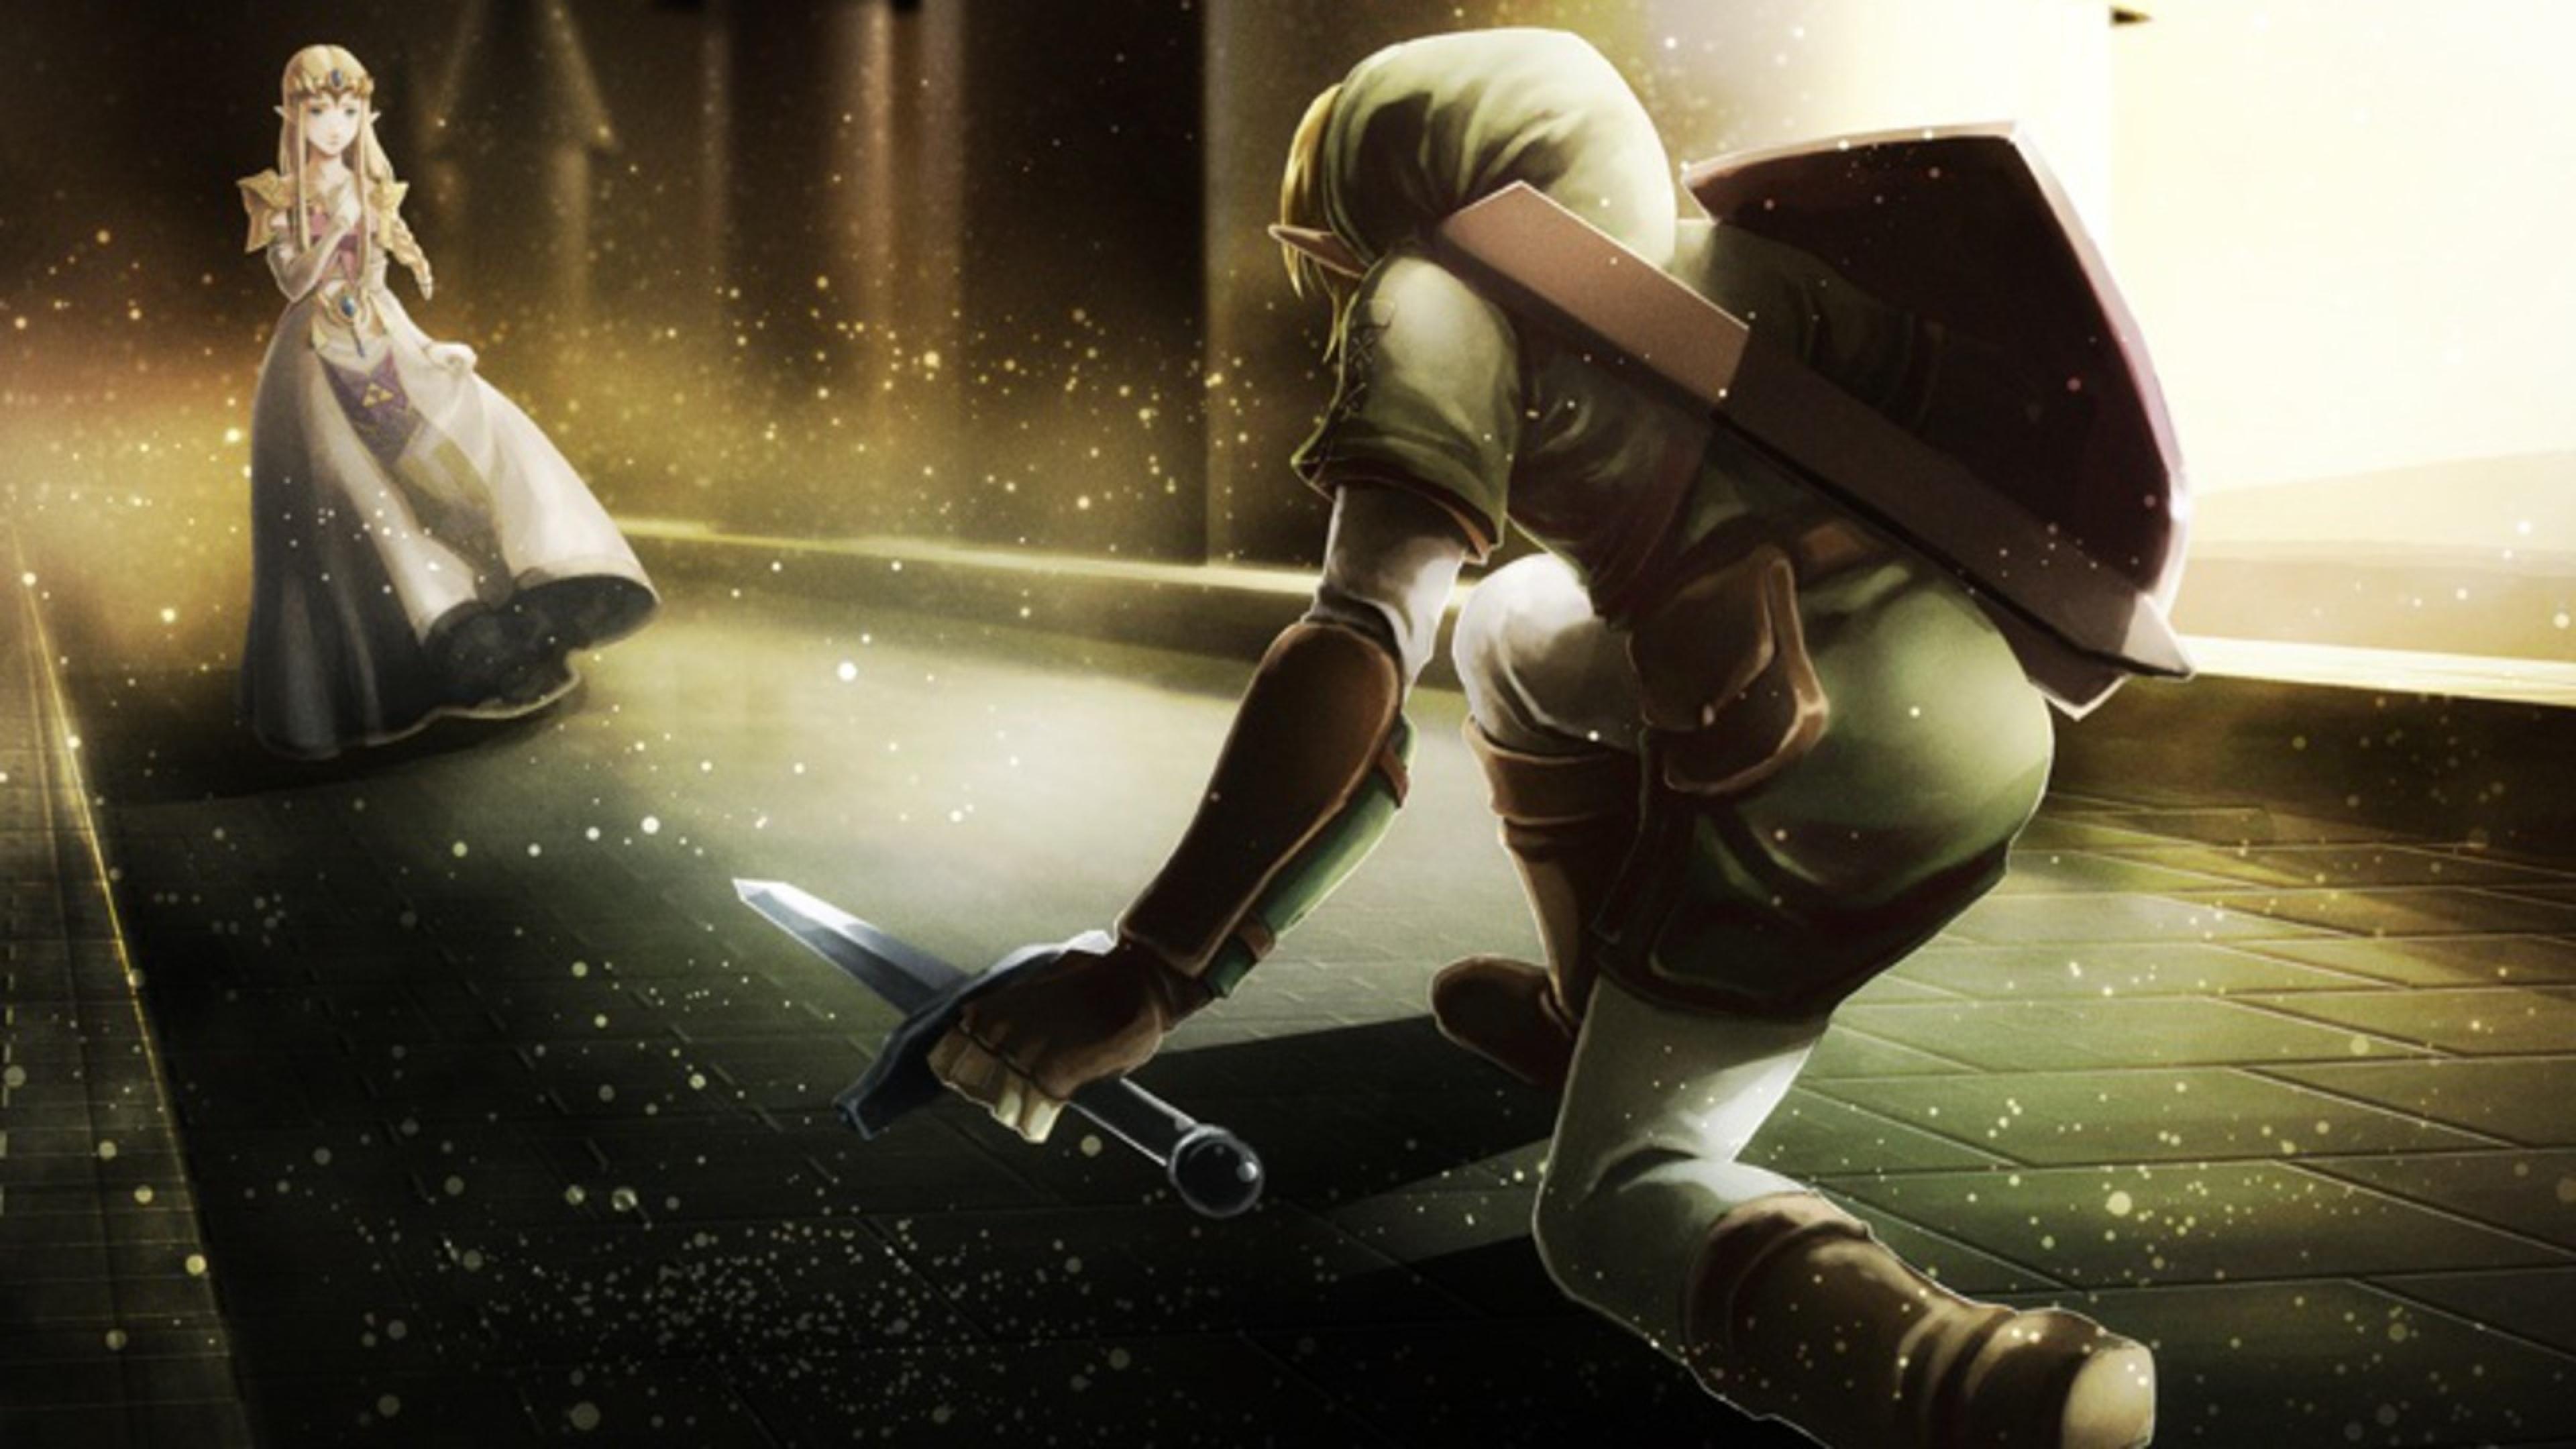 zelda Character Elf Princess Link Wallpaper Background 4K Ultra 3840x2160